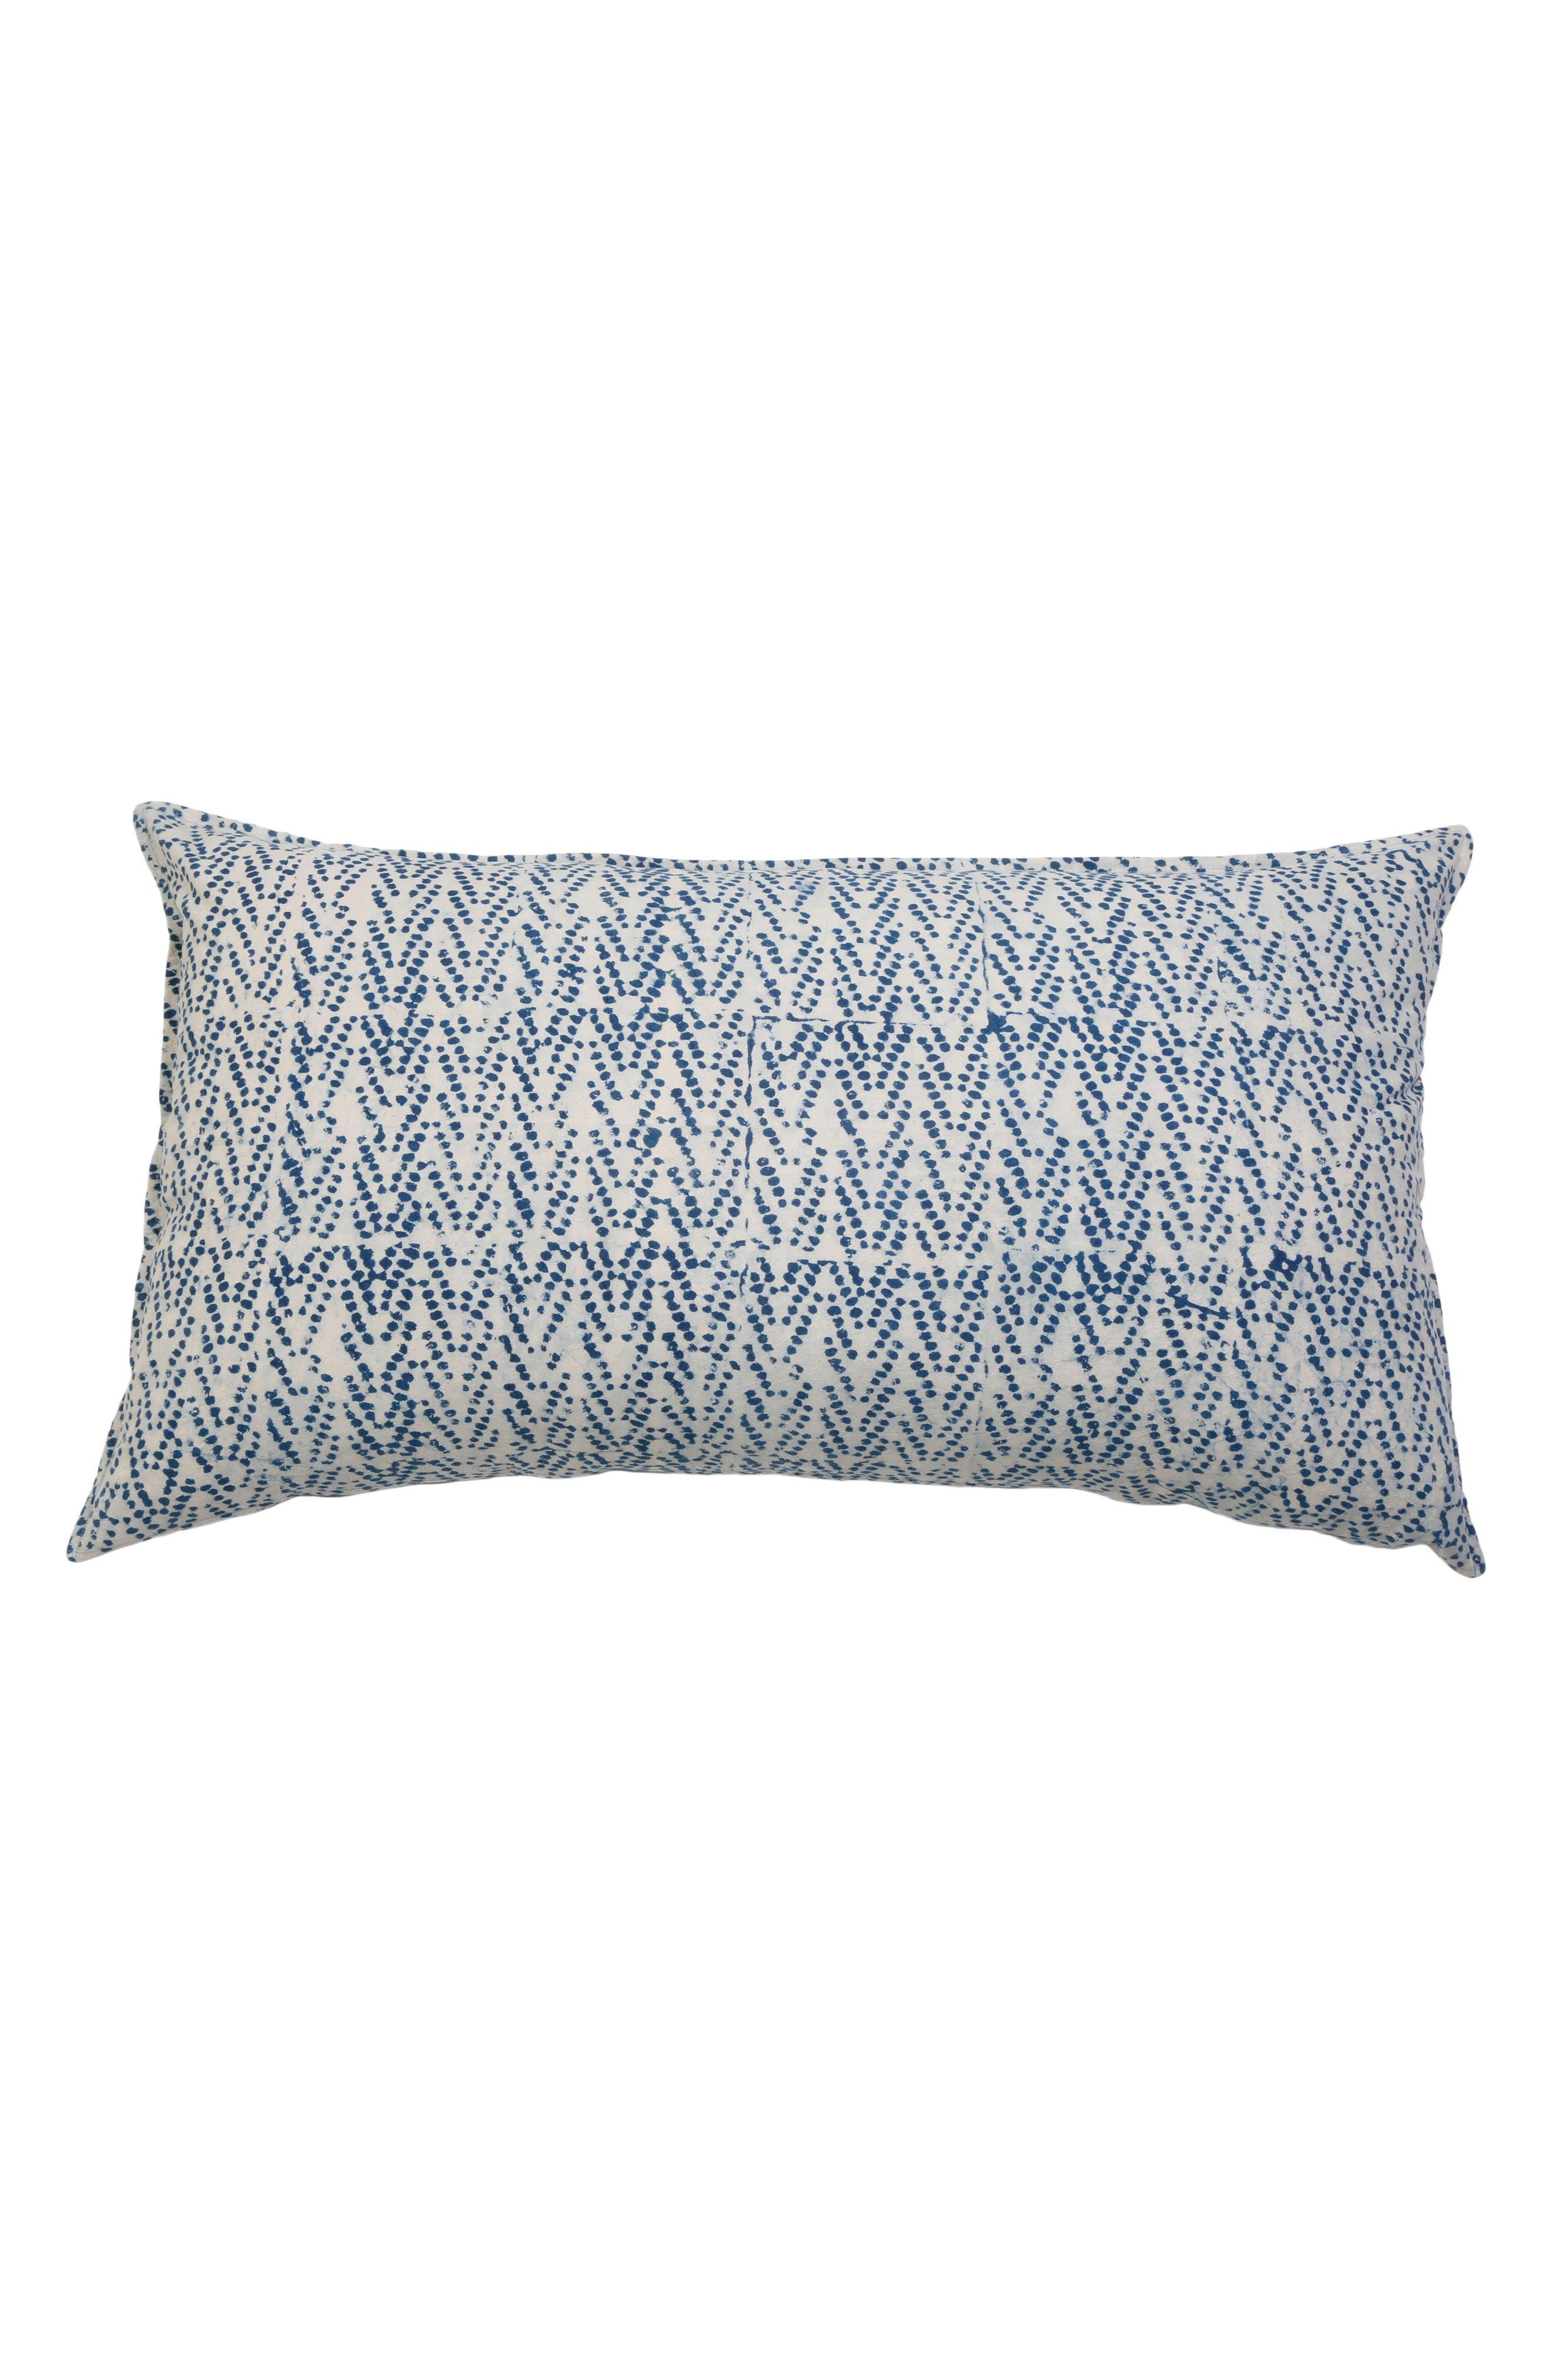 Indigo Dots Accent Pillow,                             Main thumbnail 1, color,